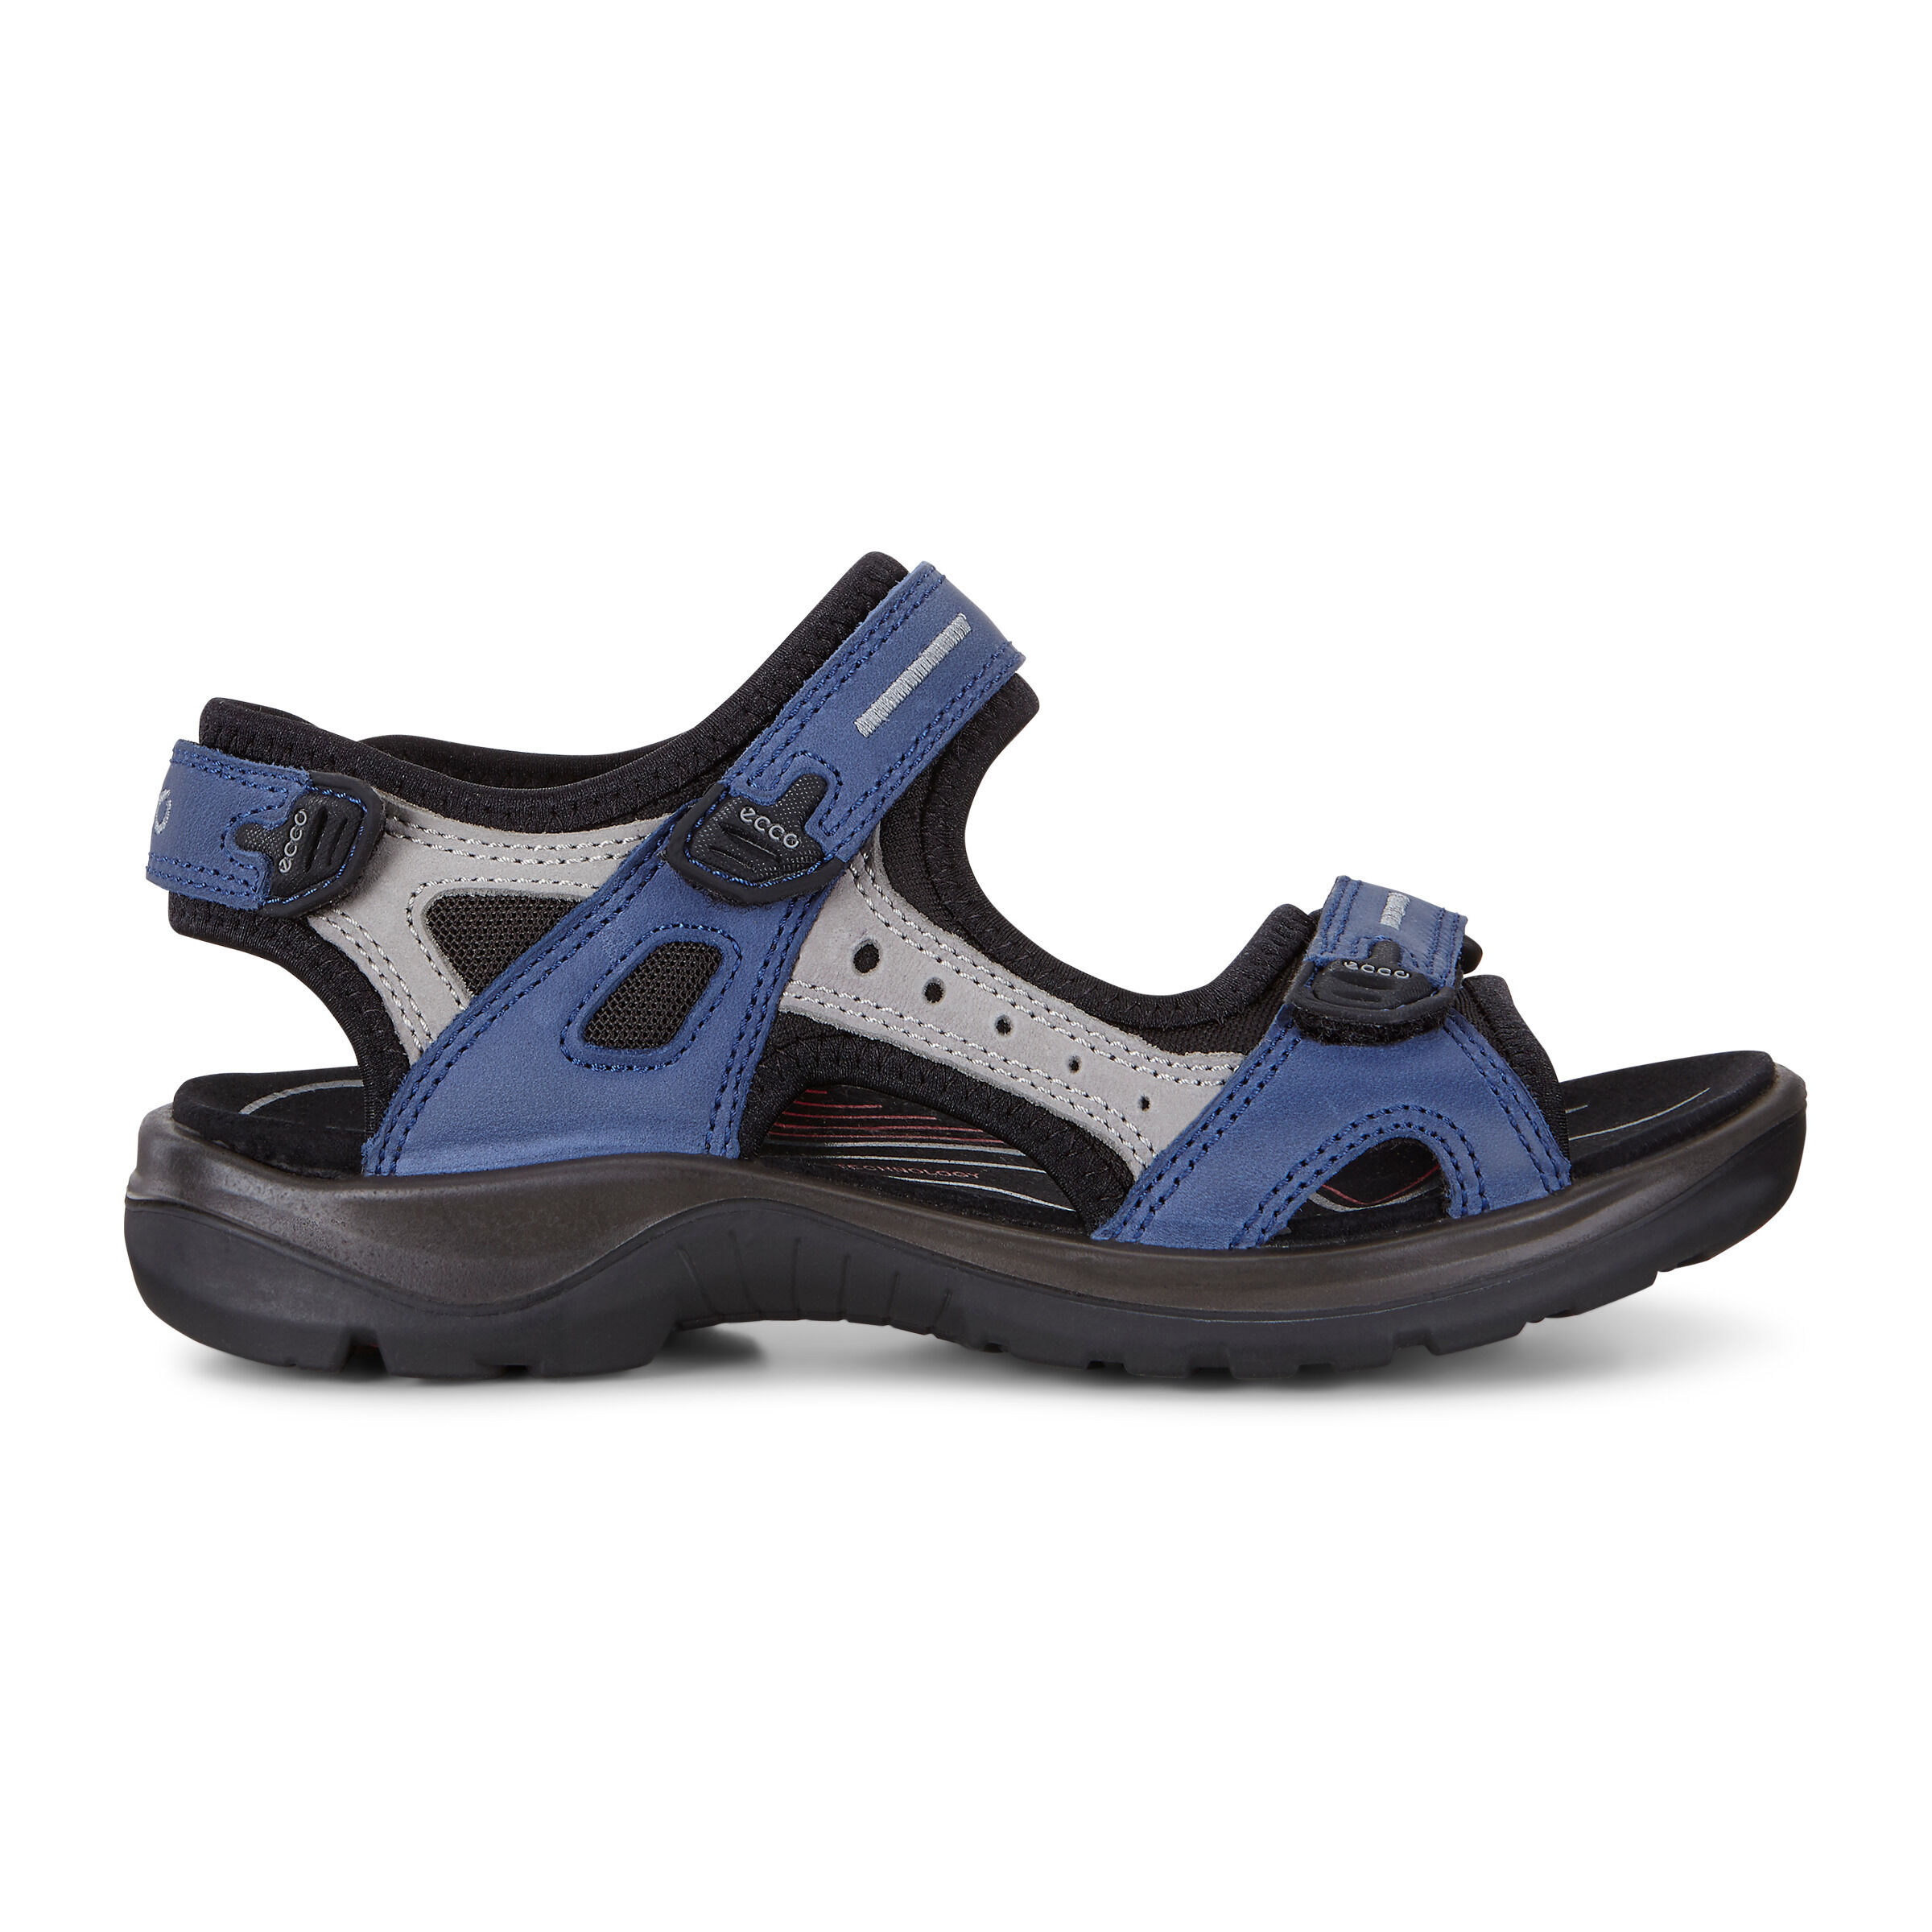 Yucatan Outdoor Sandals   ECCO® Shoes